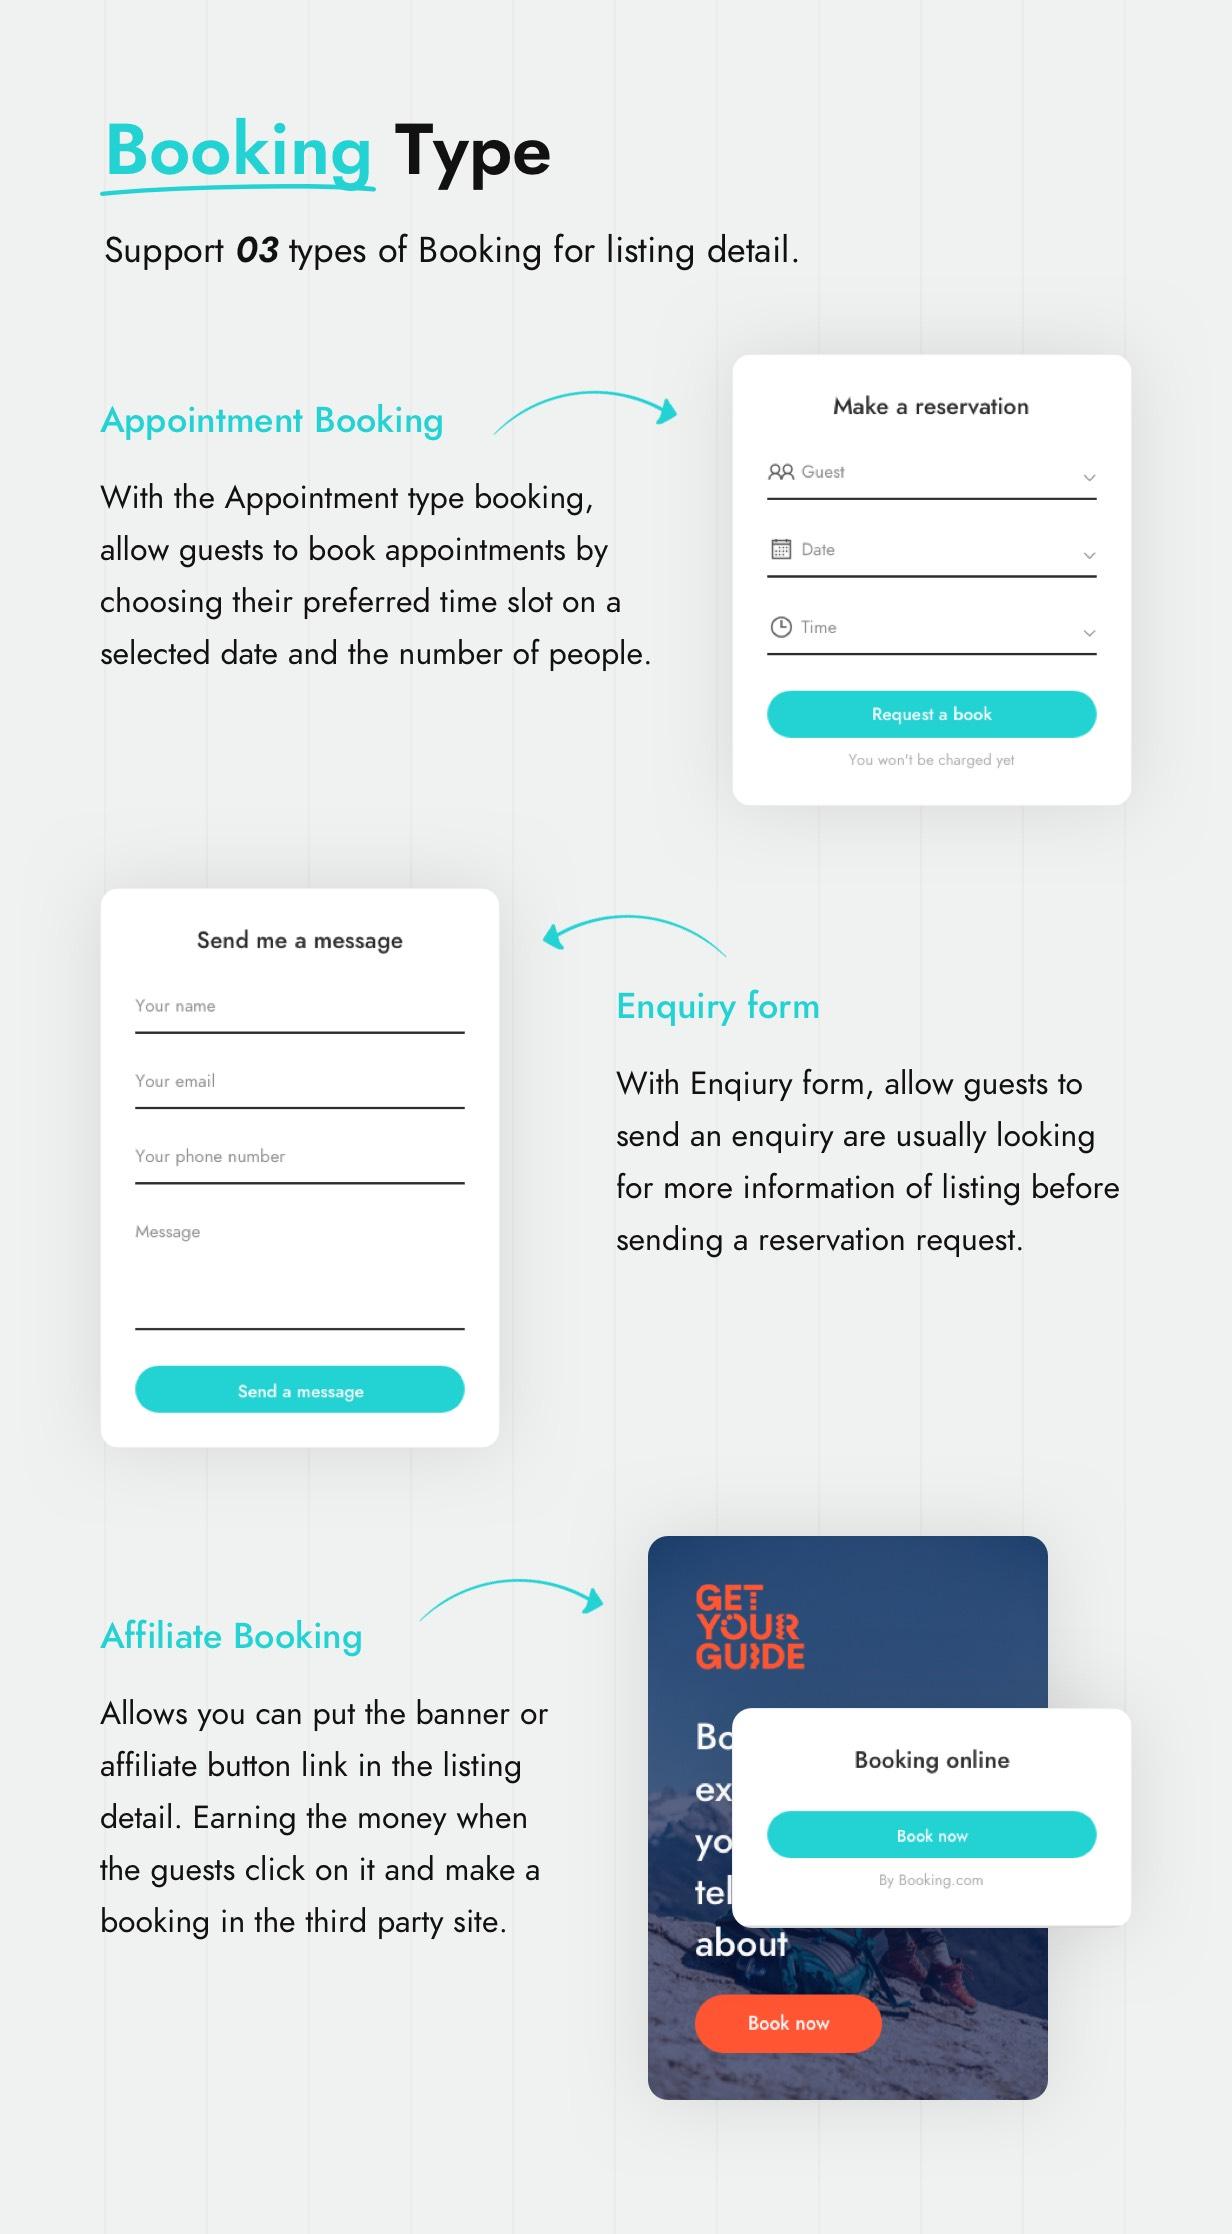 Booking Type